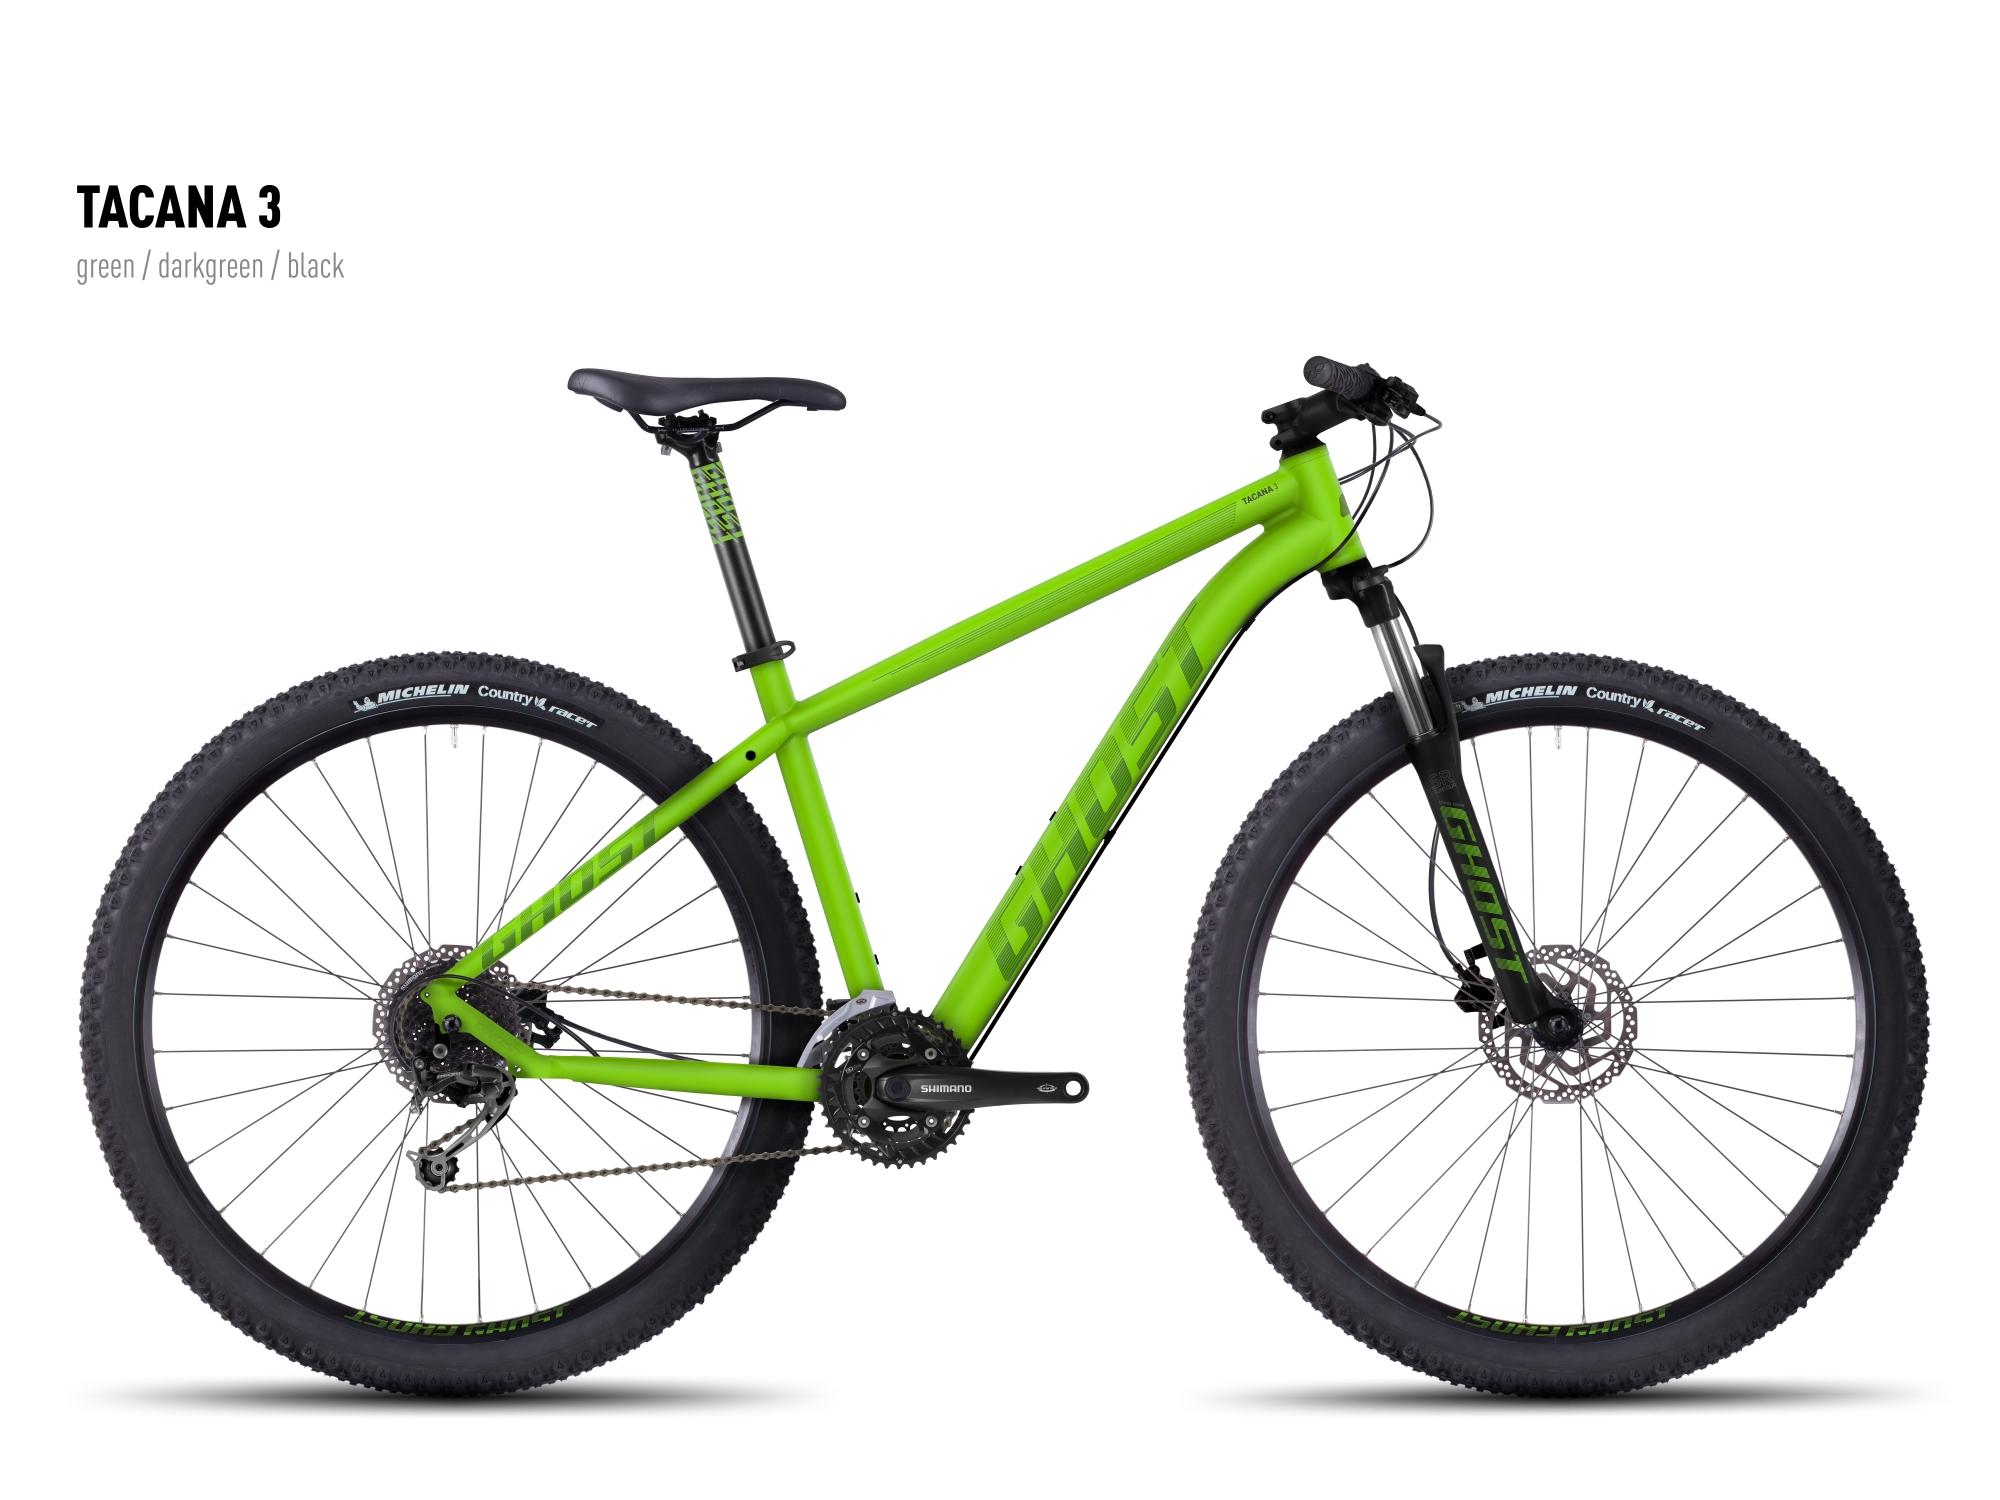 "GHOST Tacana 3 green/darkgreen/black S / 42cm / 16.5"" , 2016"